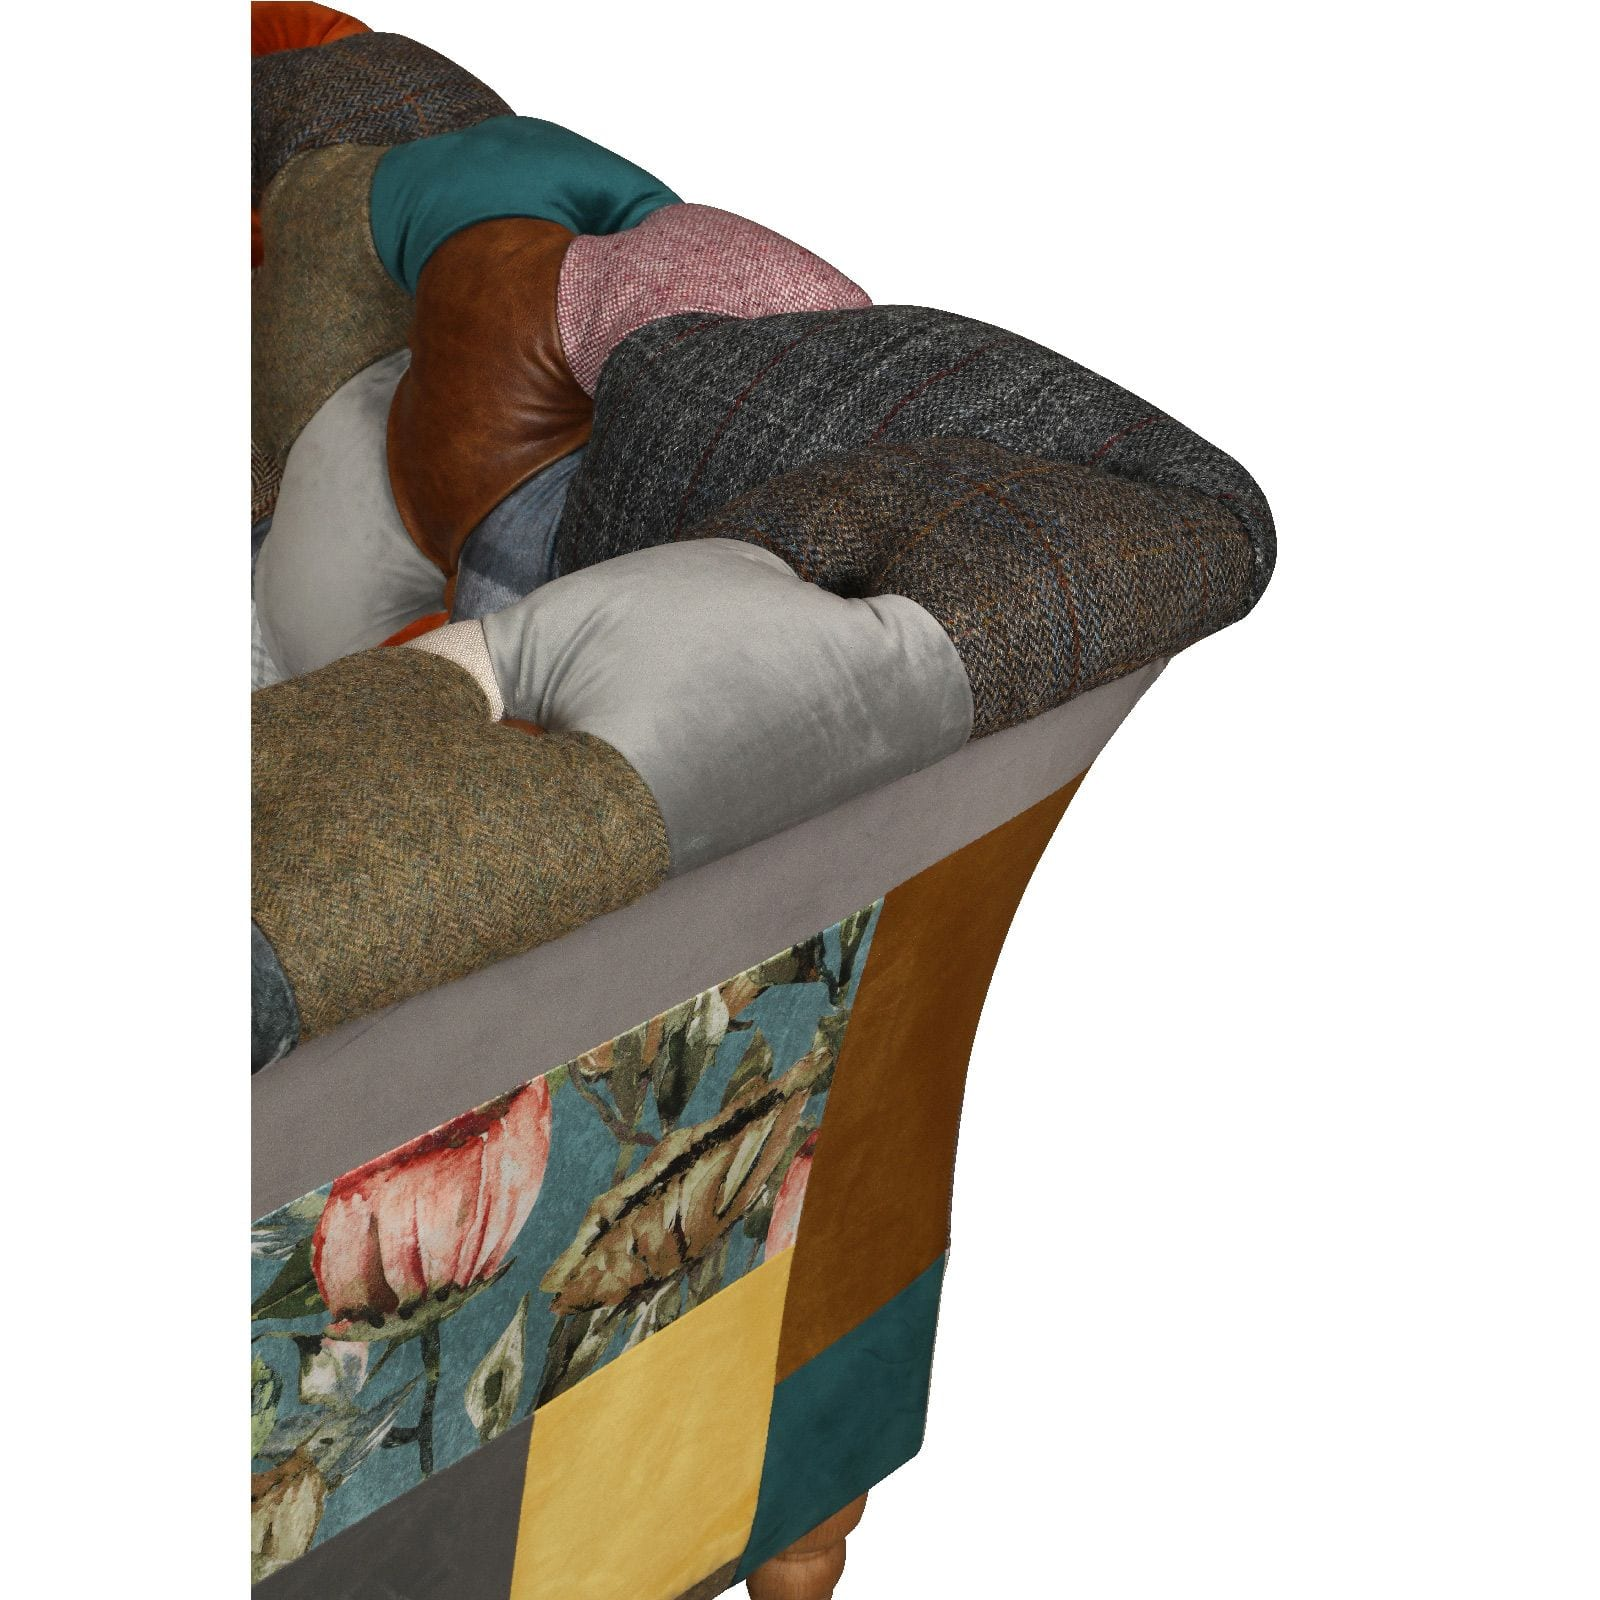 Rutland patchwork sofa close up detail